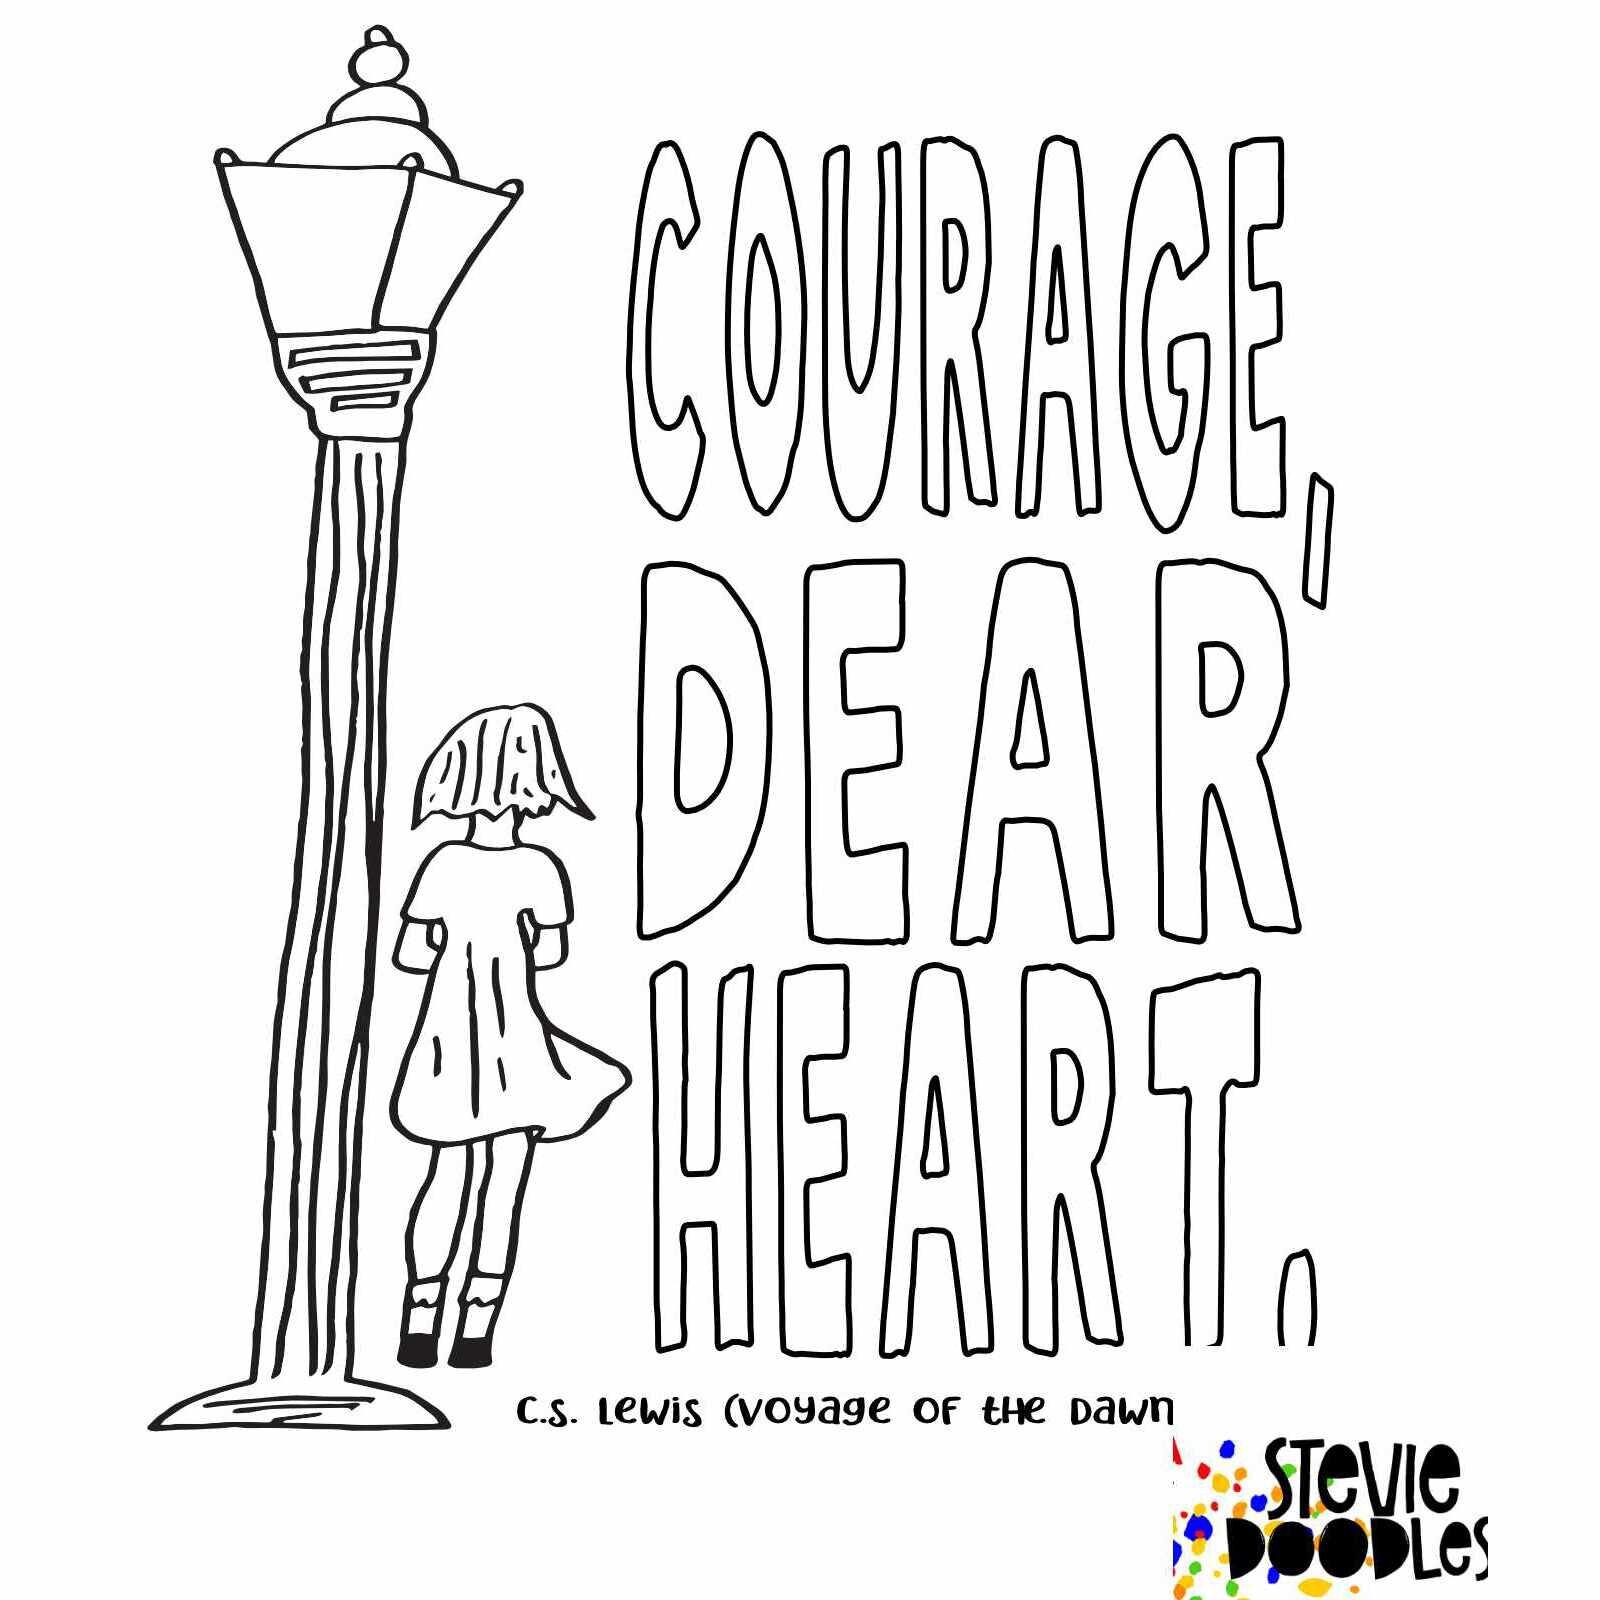 Courage Dear Heart_Square.jpg